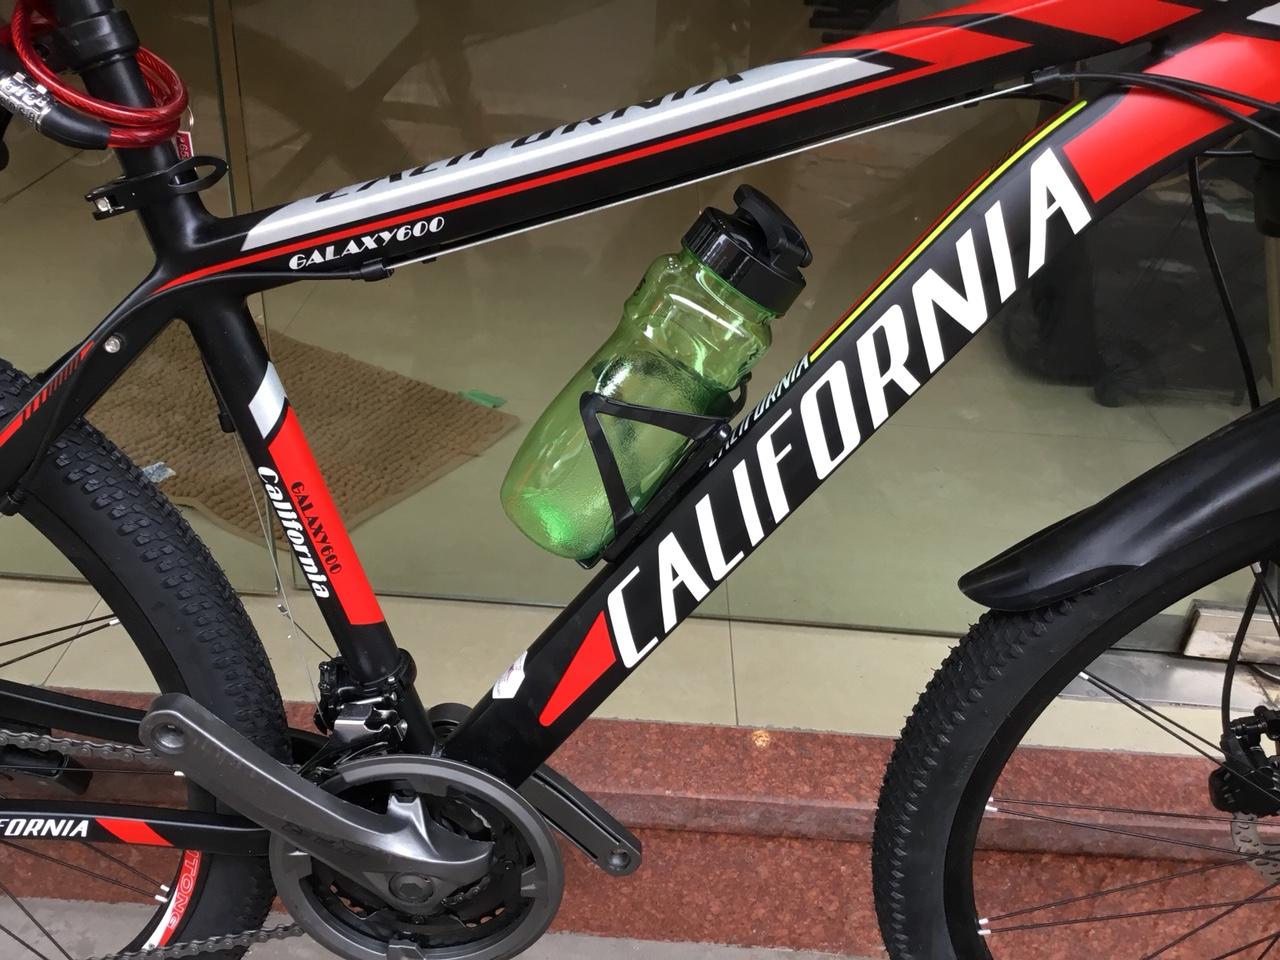 XE ĐẠP CALIFORNIA GALAXY 600